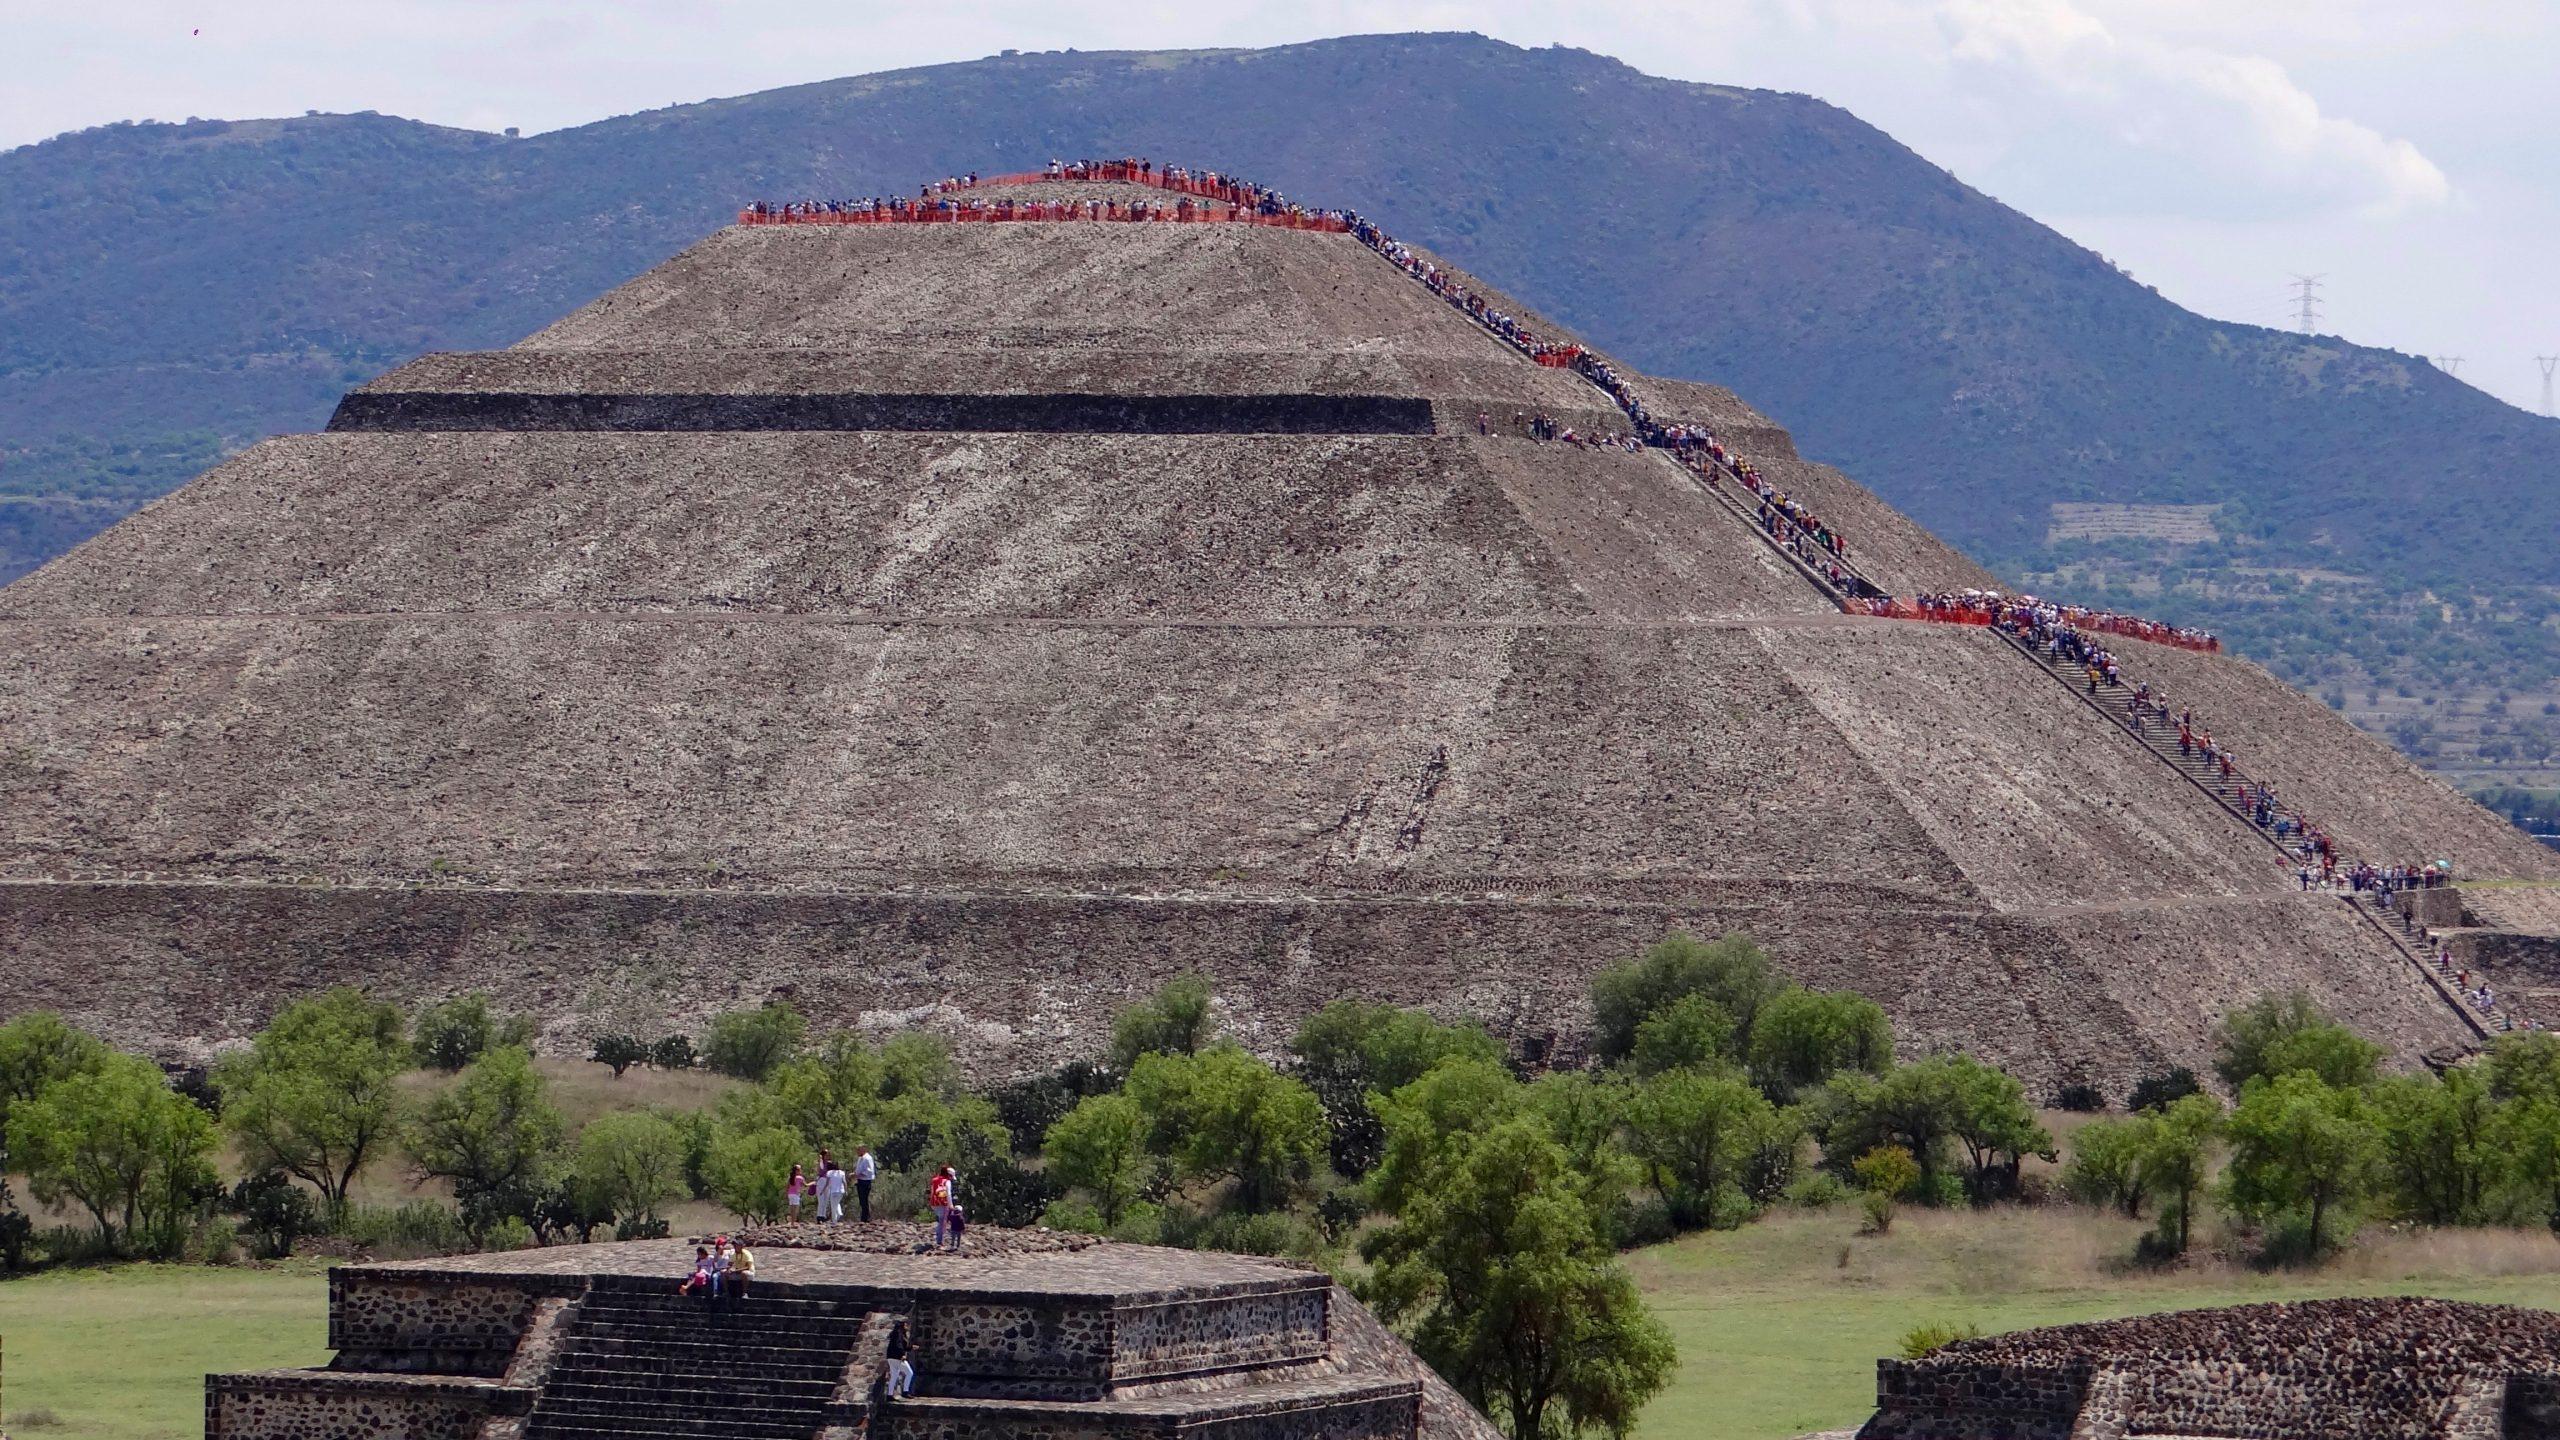 teotihuacan scaled - Meksiko'yu 10 Mekanla Tanımak